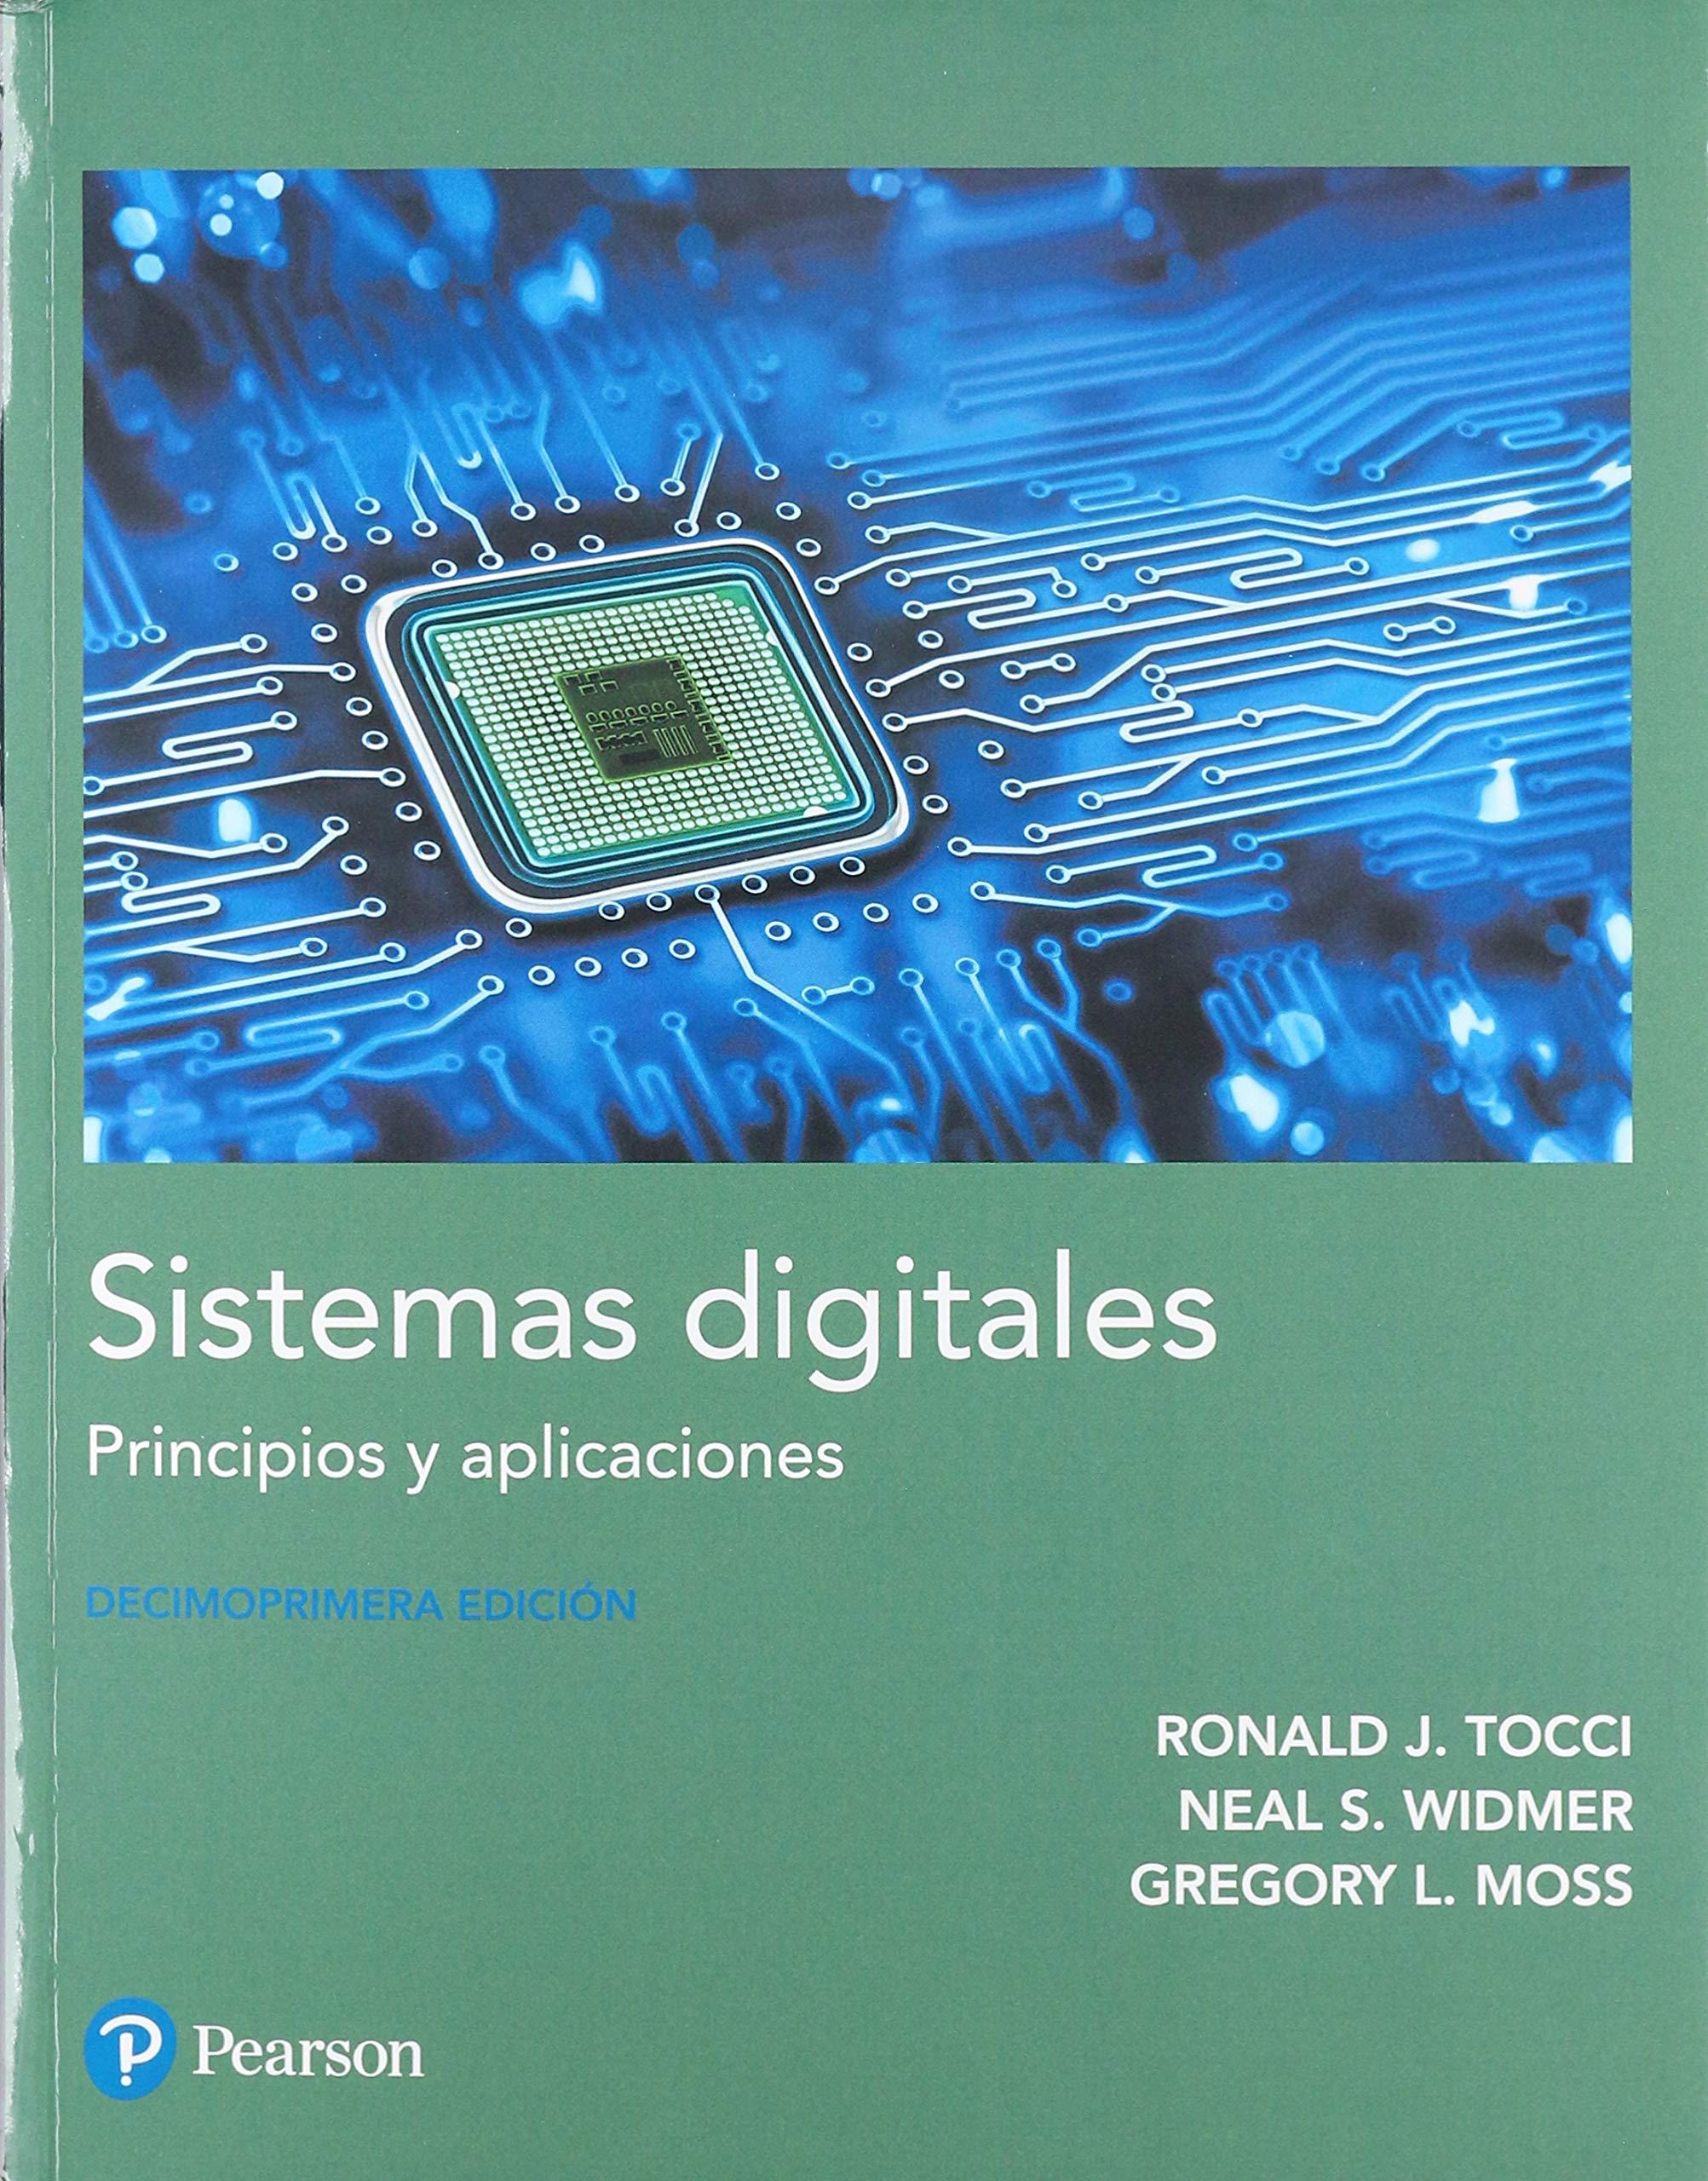 sistemas digitales de tocci